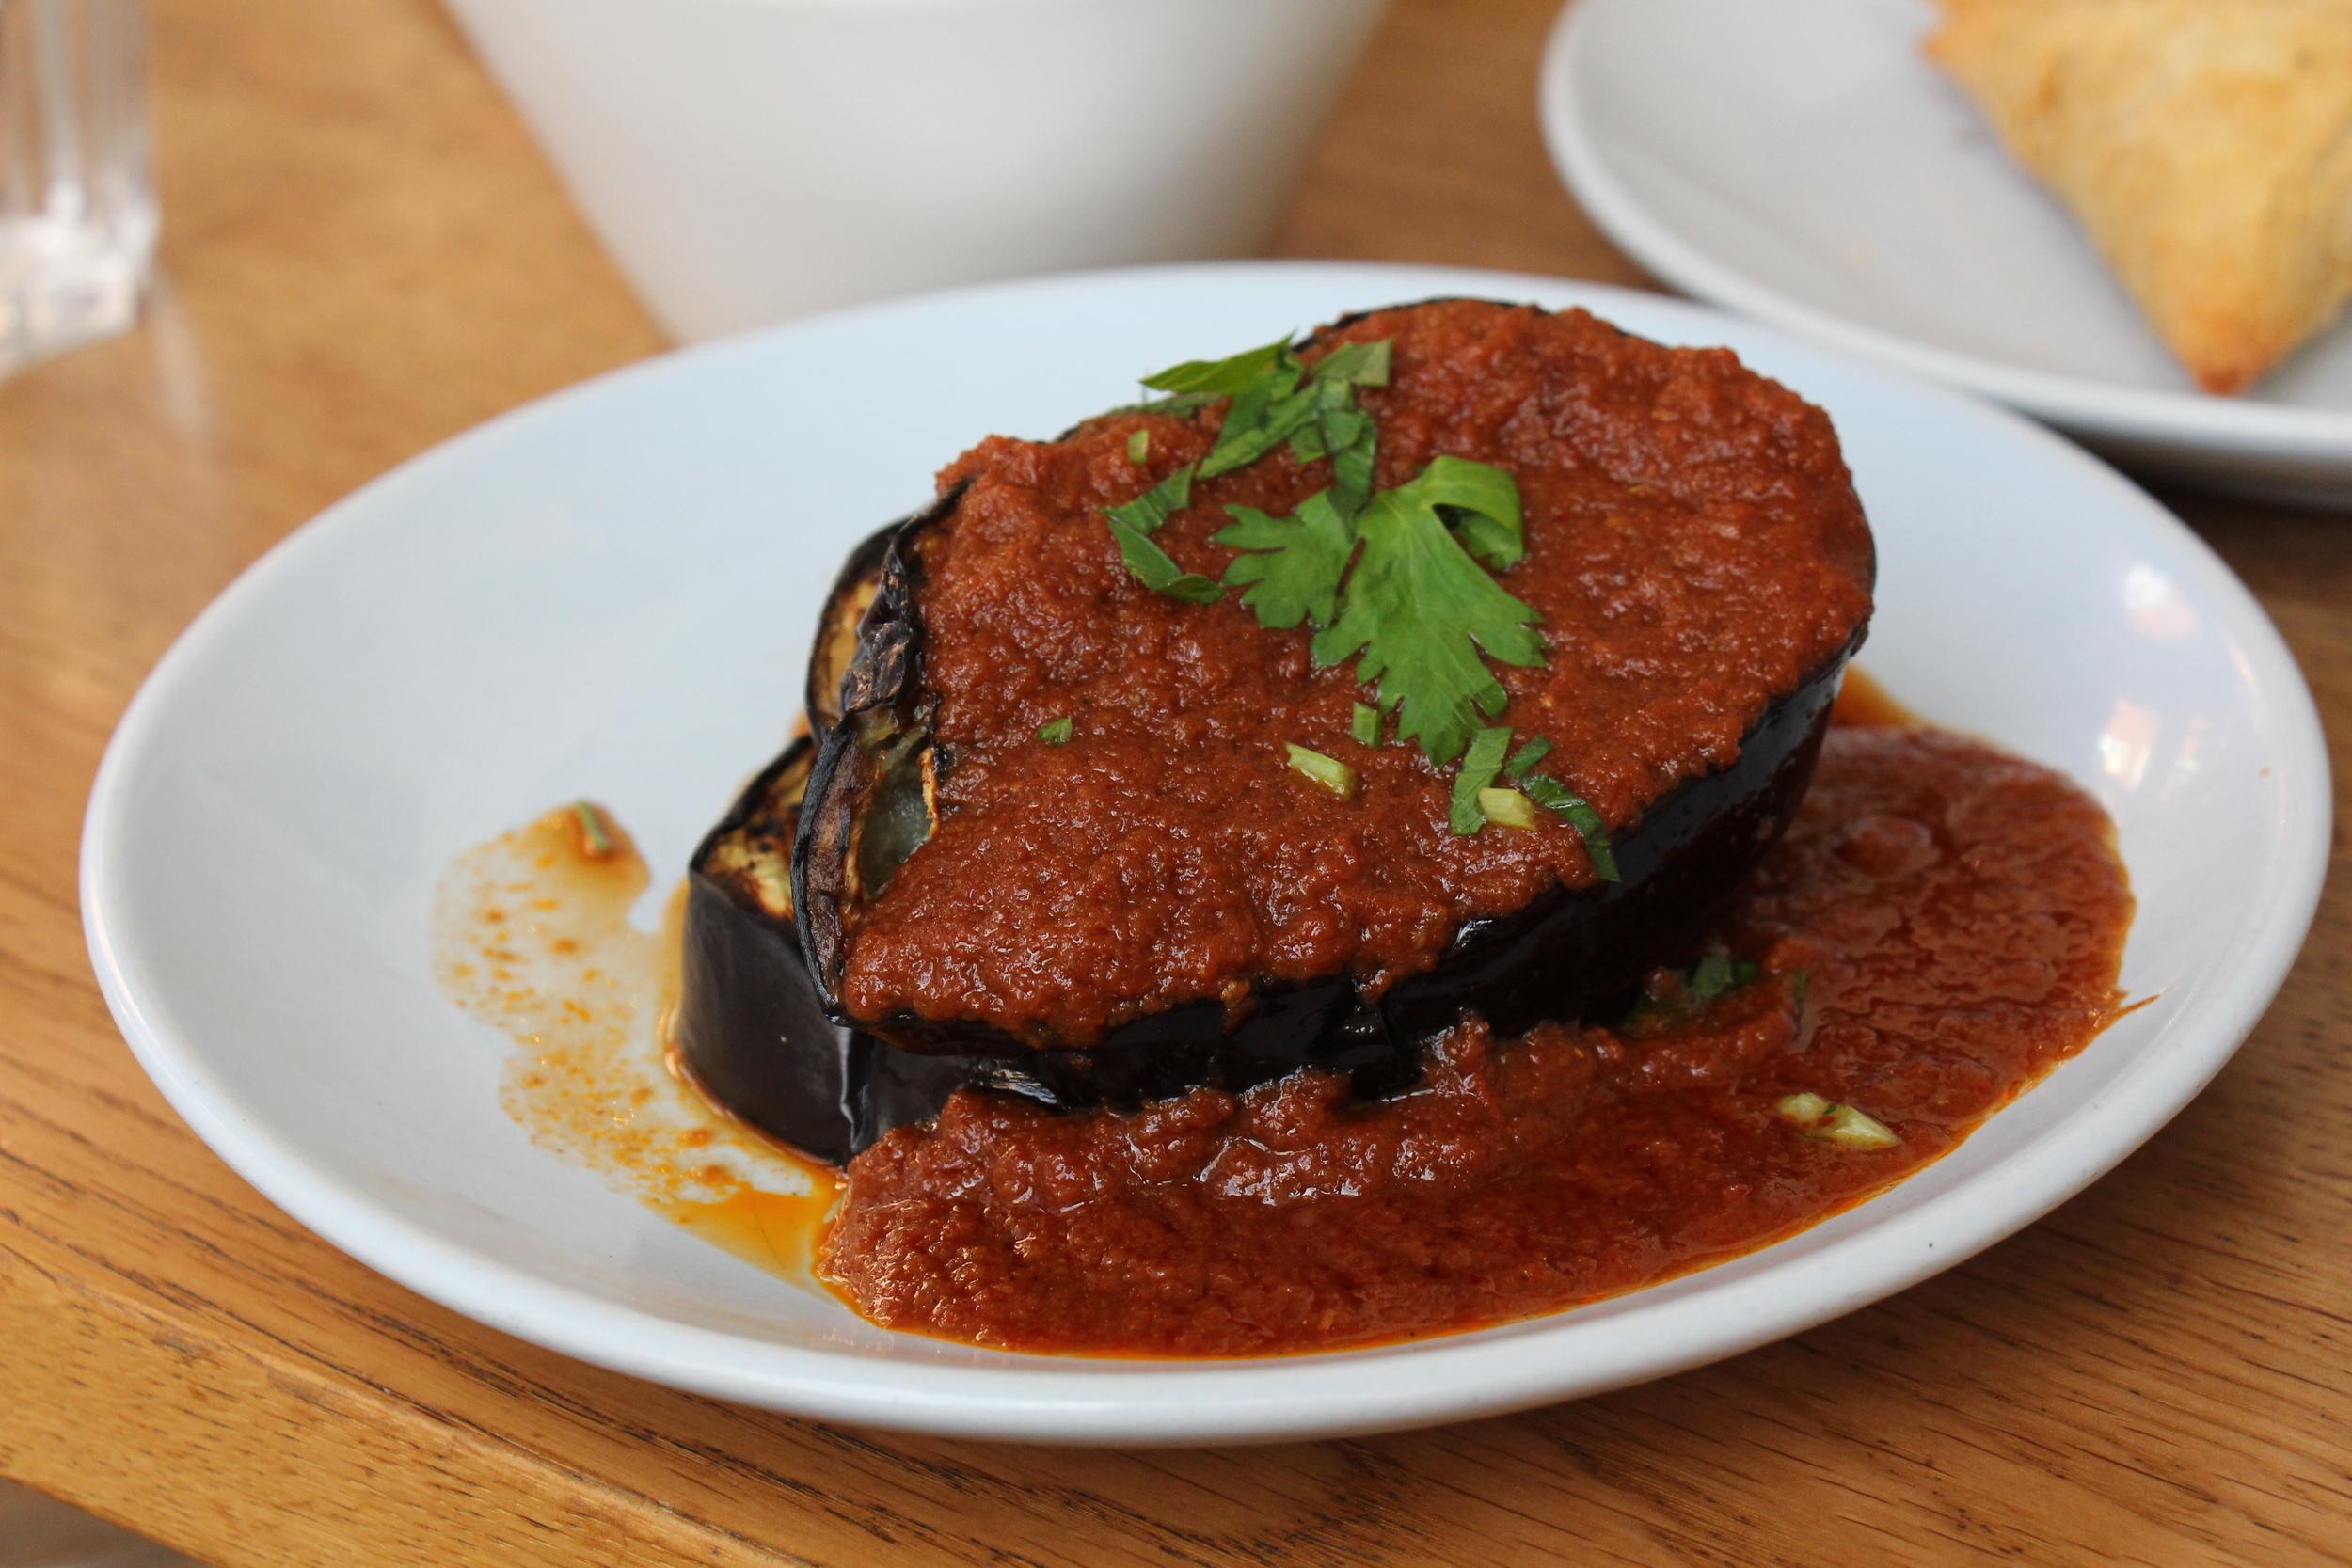 Grilled Aubergine with Garlic Tomato Sauce